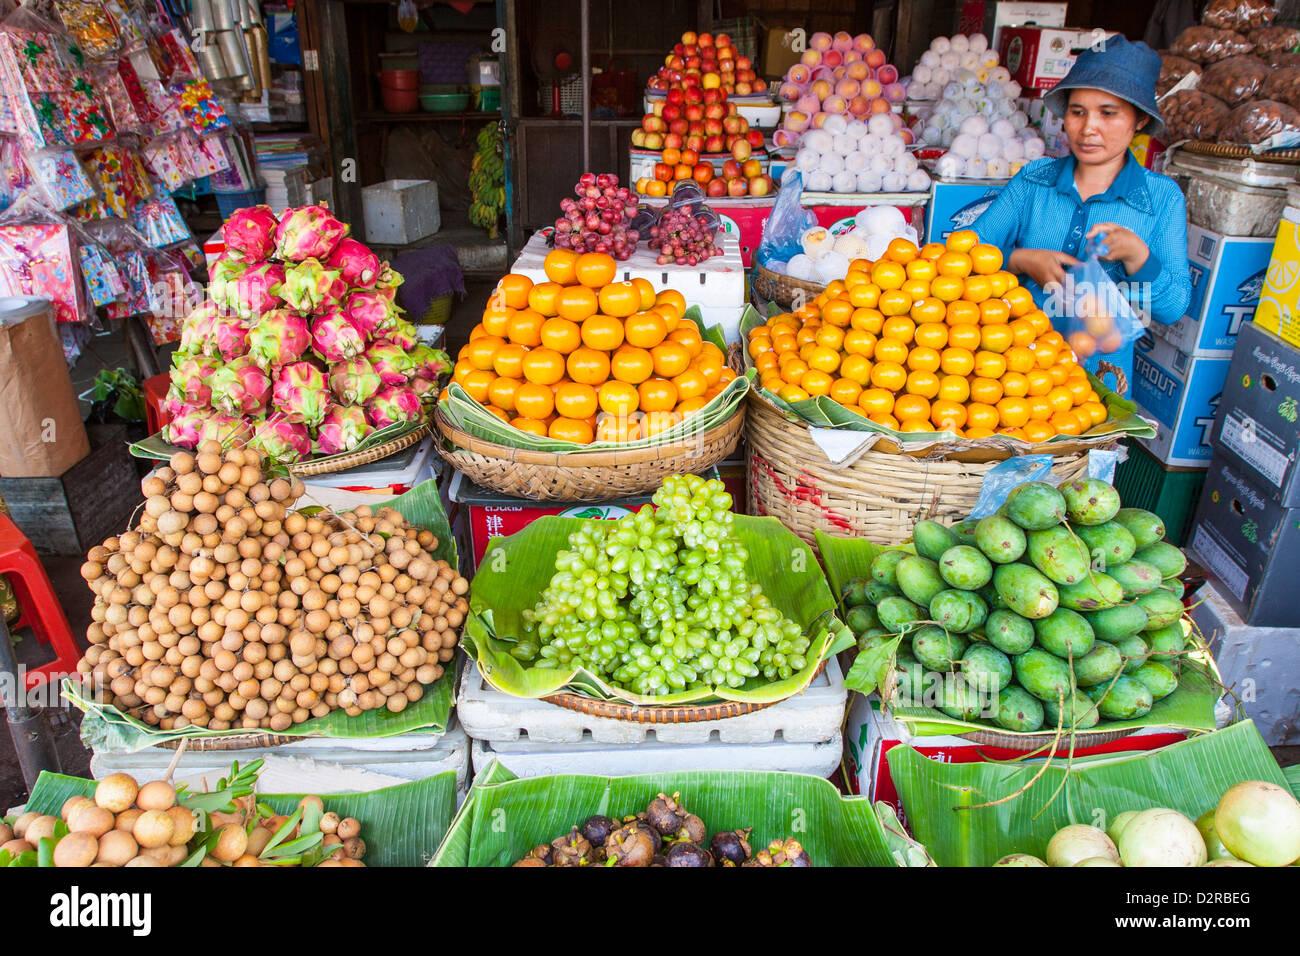 Fruit, Central Market, Phnom Penh, Cambodia, Indochina, Southeast Asia, Asia - Stock Image